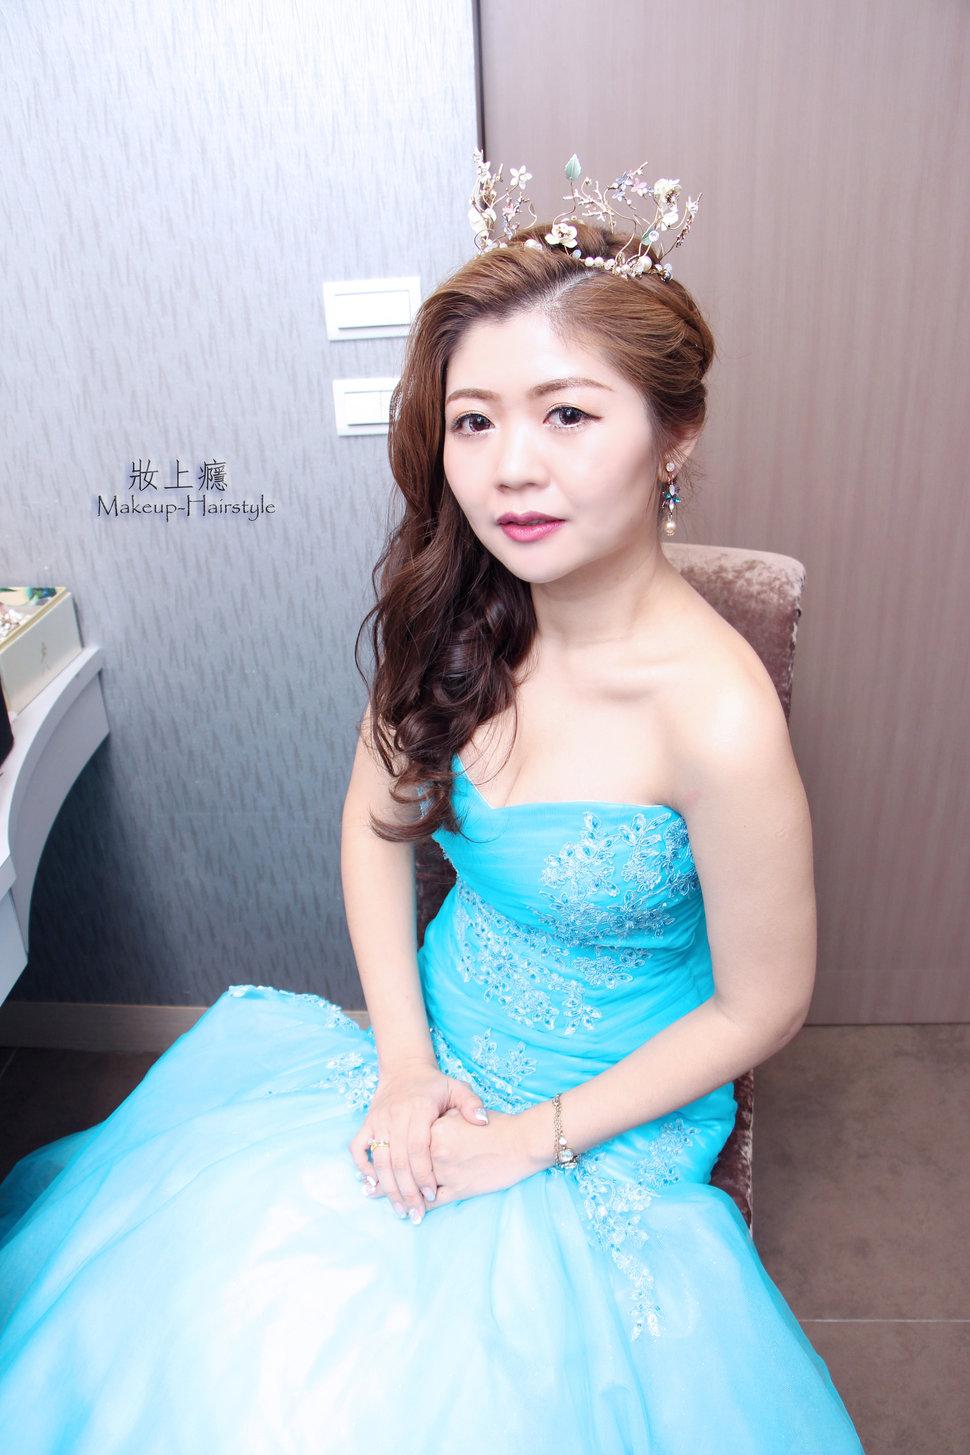 13 - Makeup-hairstyle 妝上癮 - 結婚吧一站式婚禮服務平台